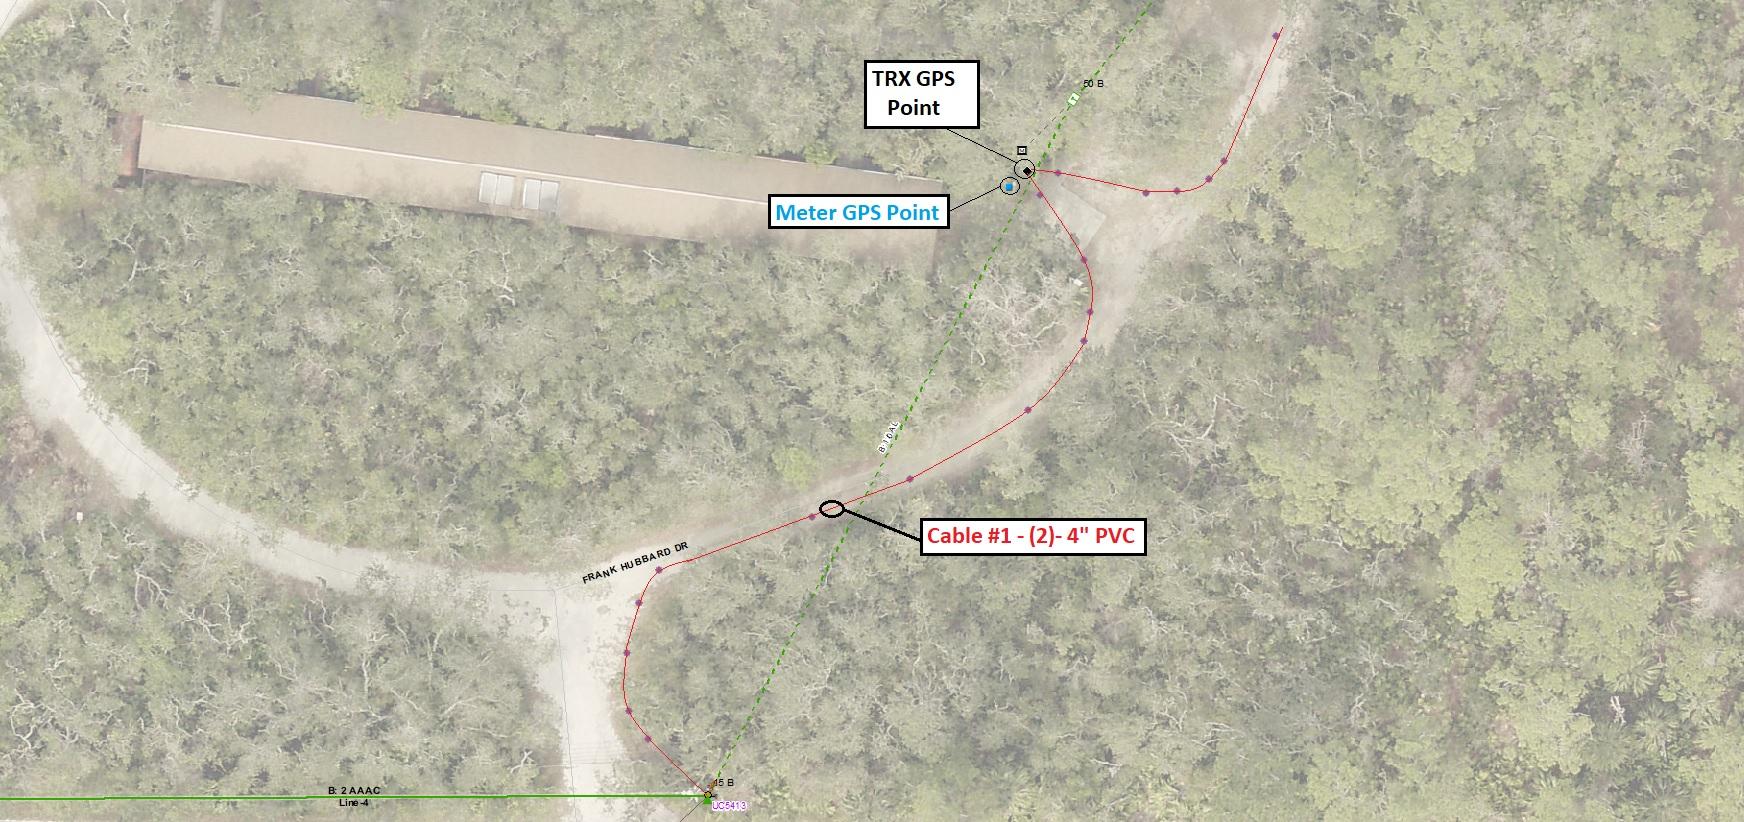 GPS Pole Capture Close Up New Smyrna Beach Utilities Commission Florida Frank Hubbard GIS vs CAD